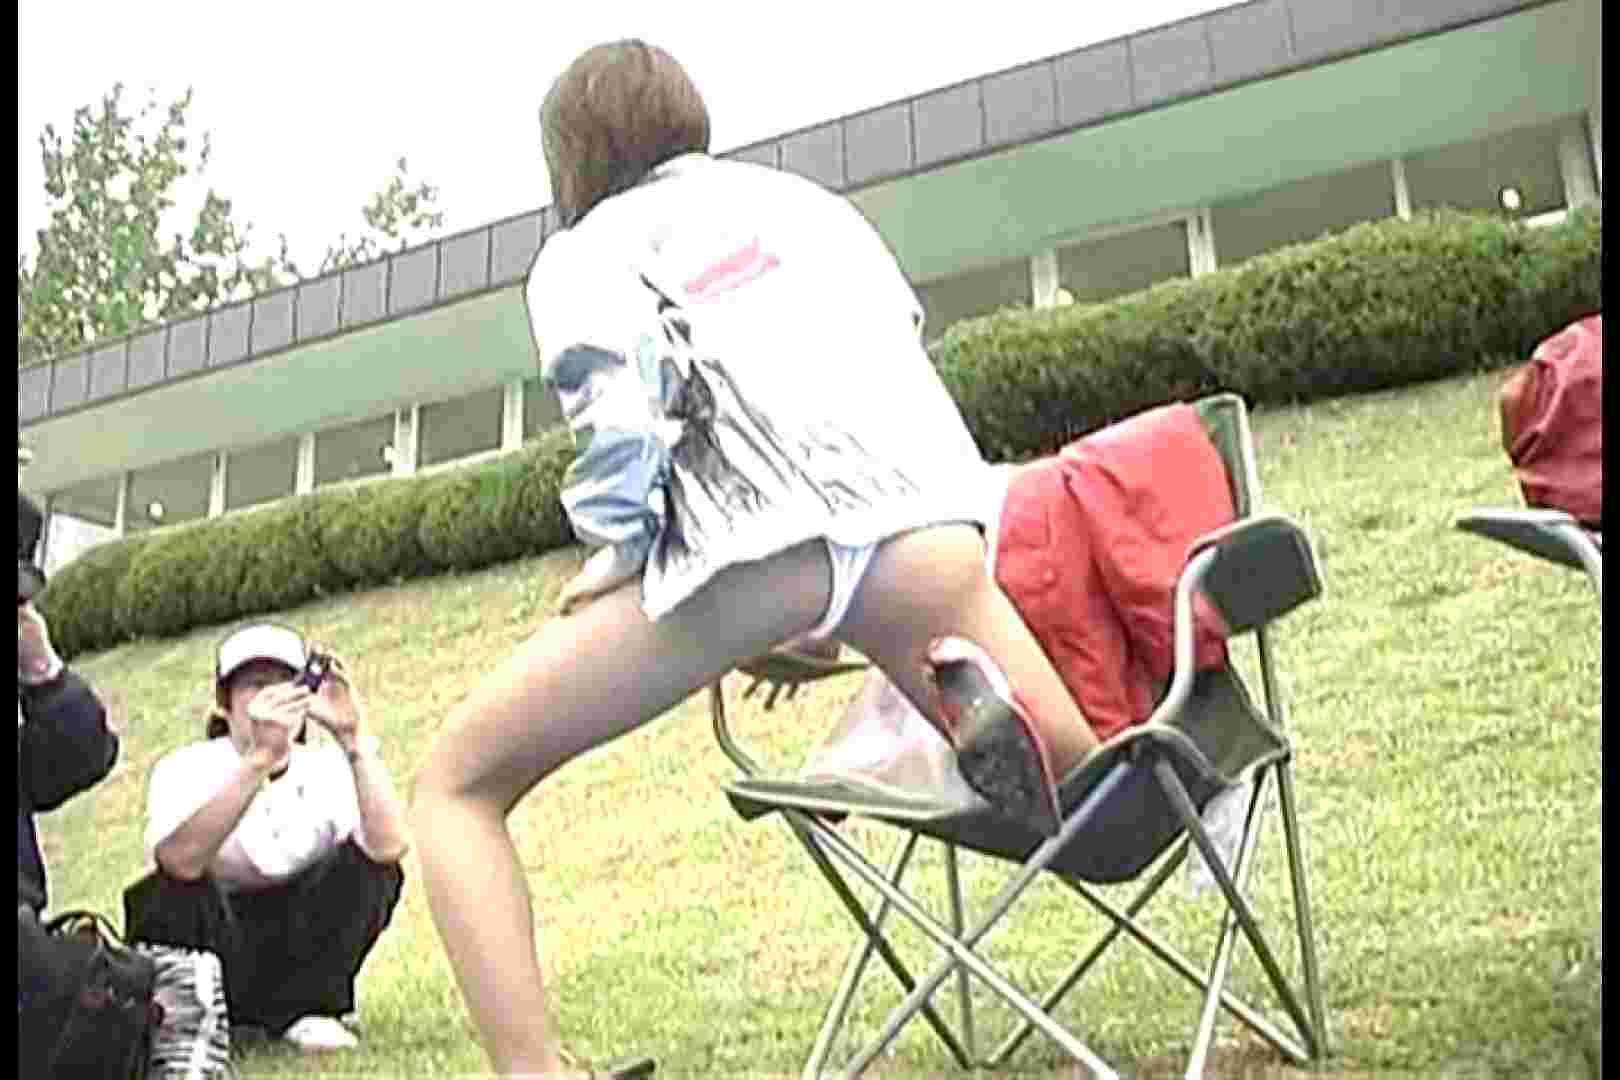 RQカメラ地獄Vol.4 股間 スケベ動画紹介 104pic 9